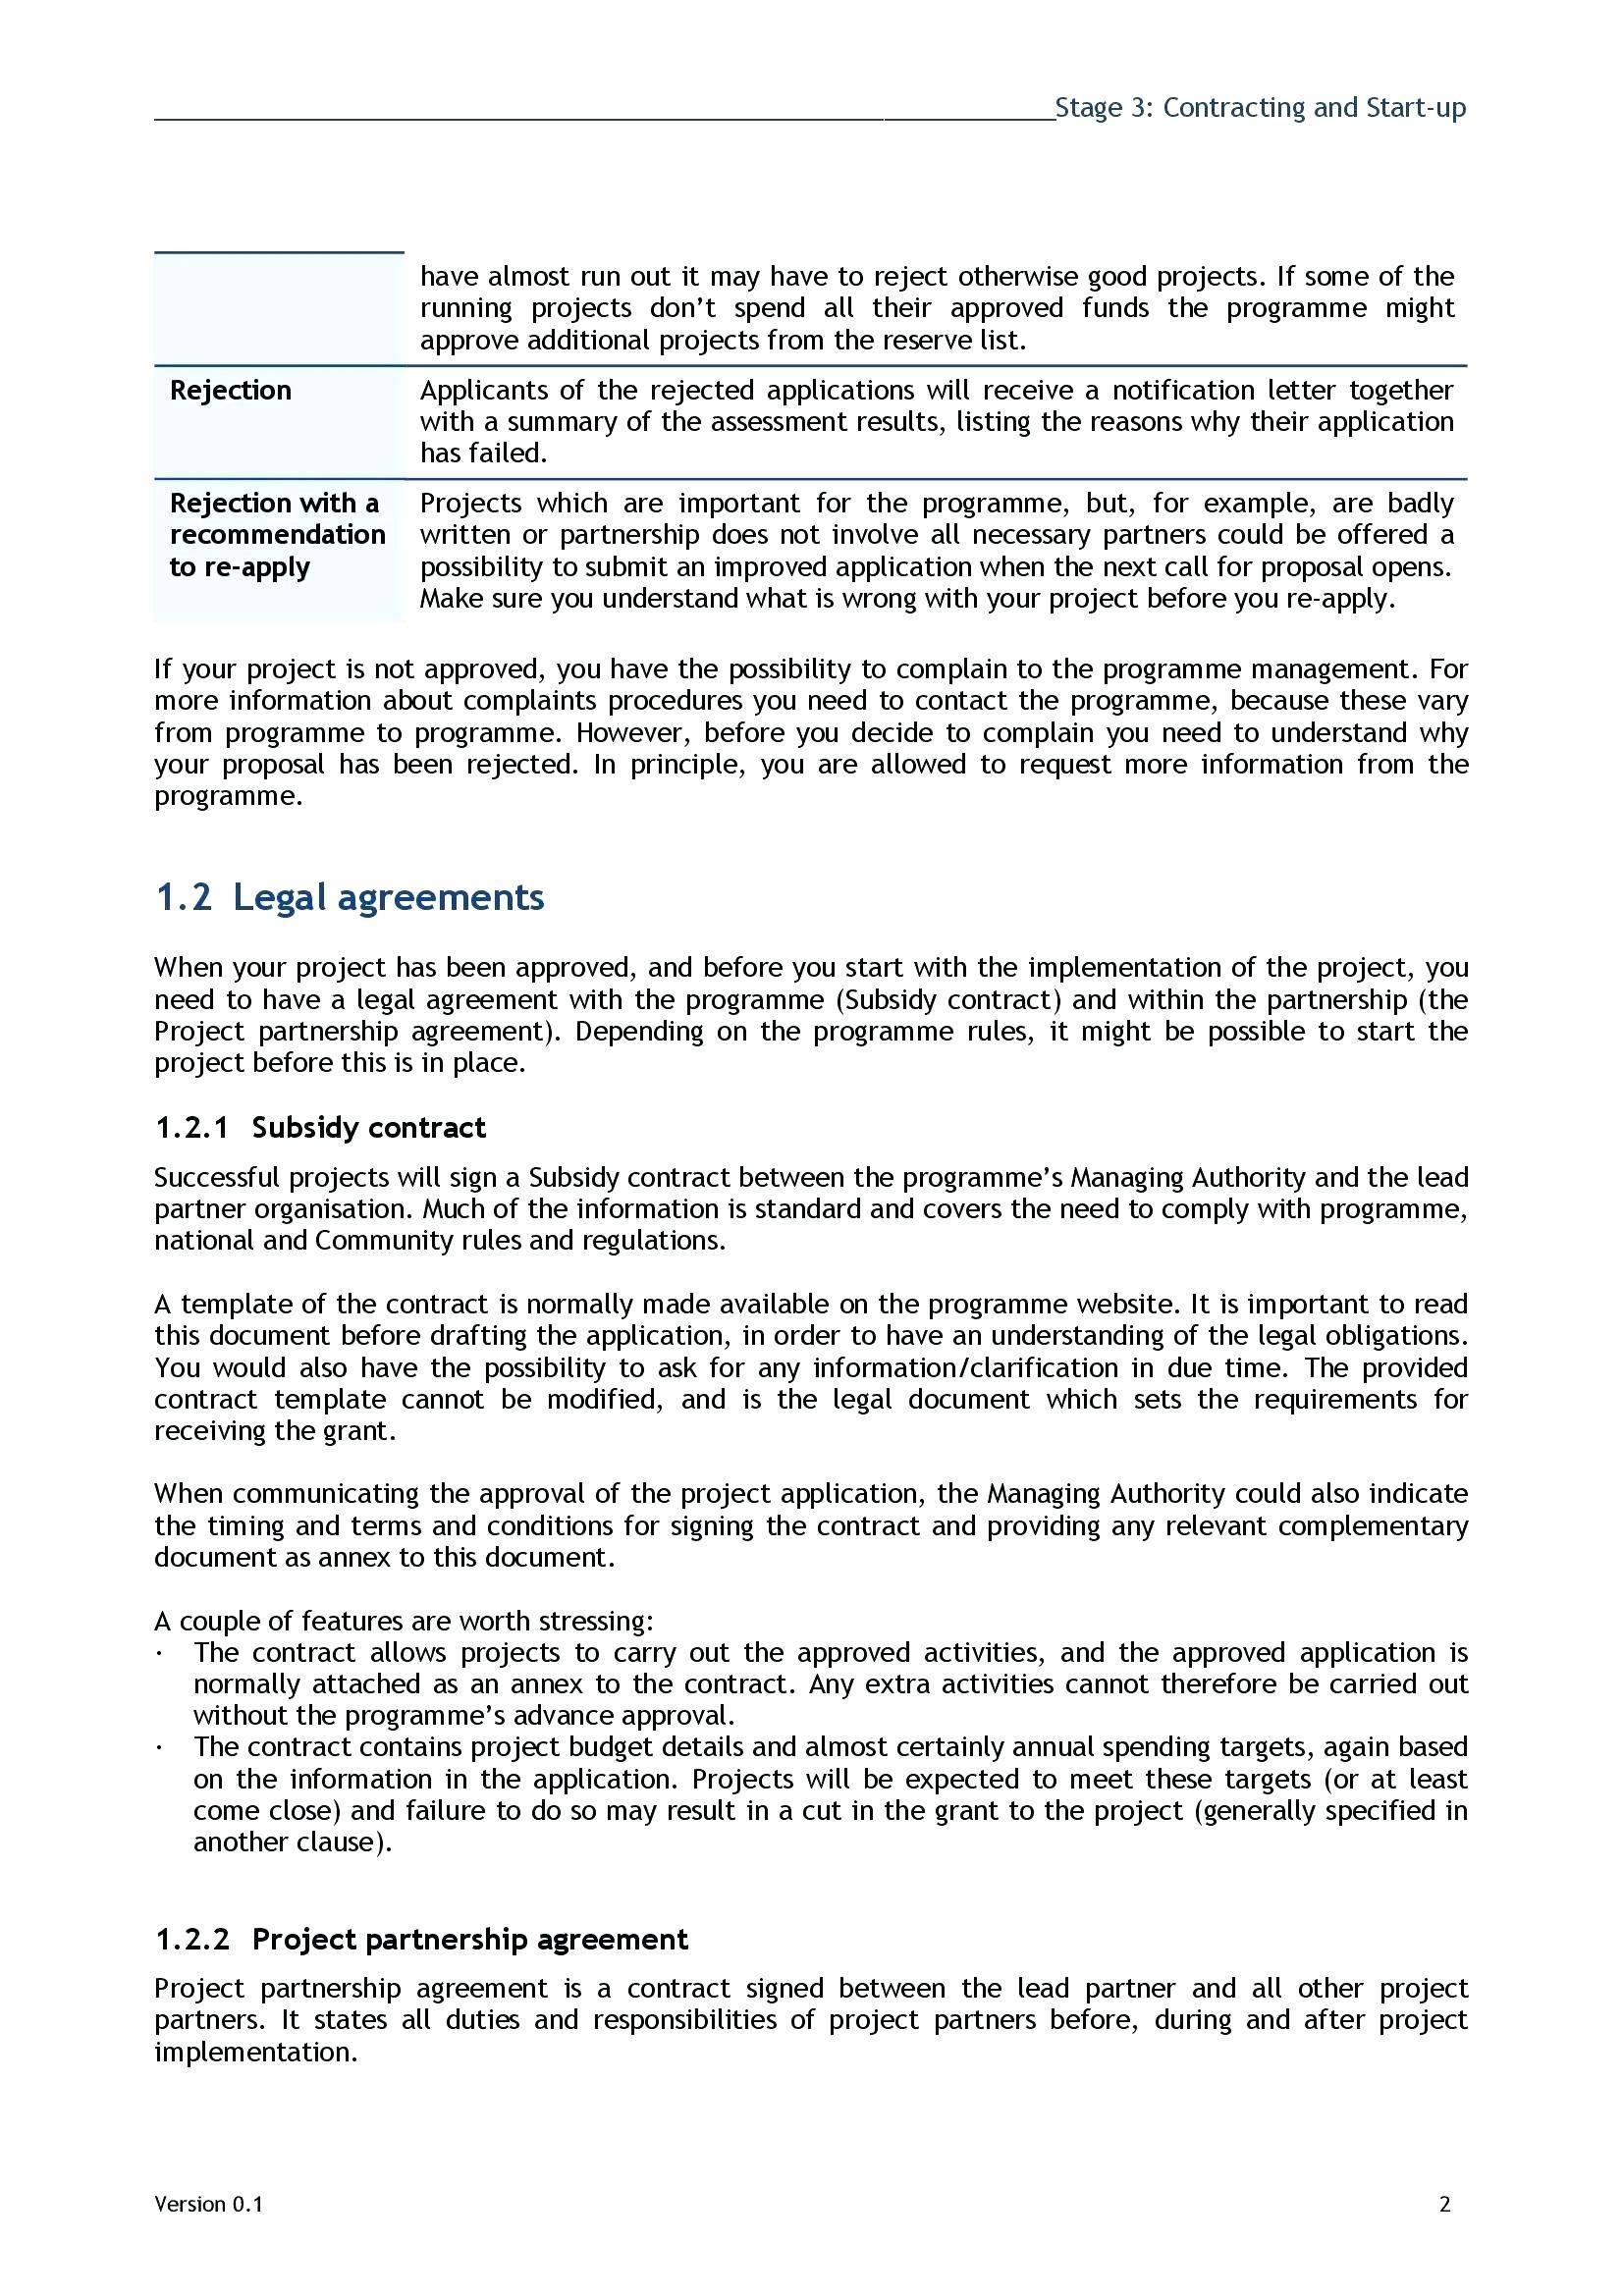 Hold Harmless Agreement Form For Repossessing Cars